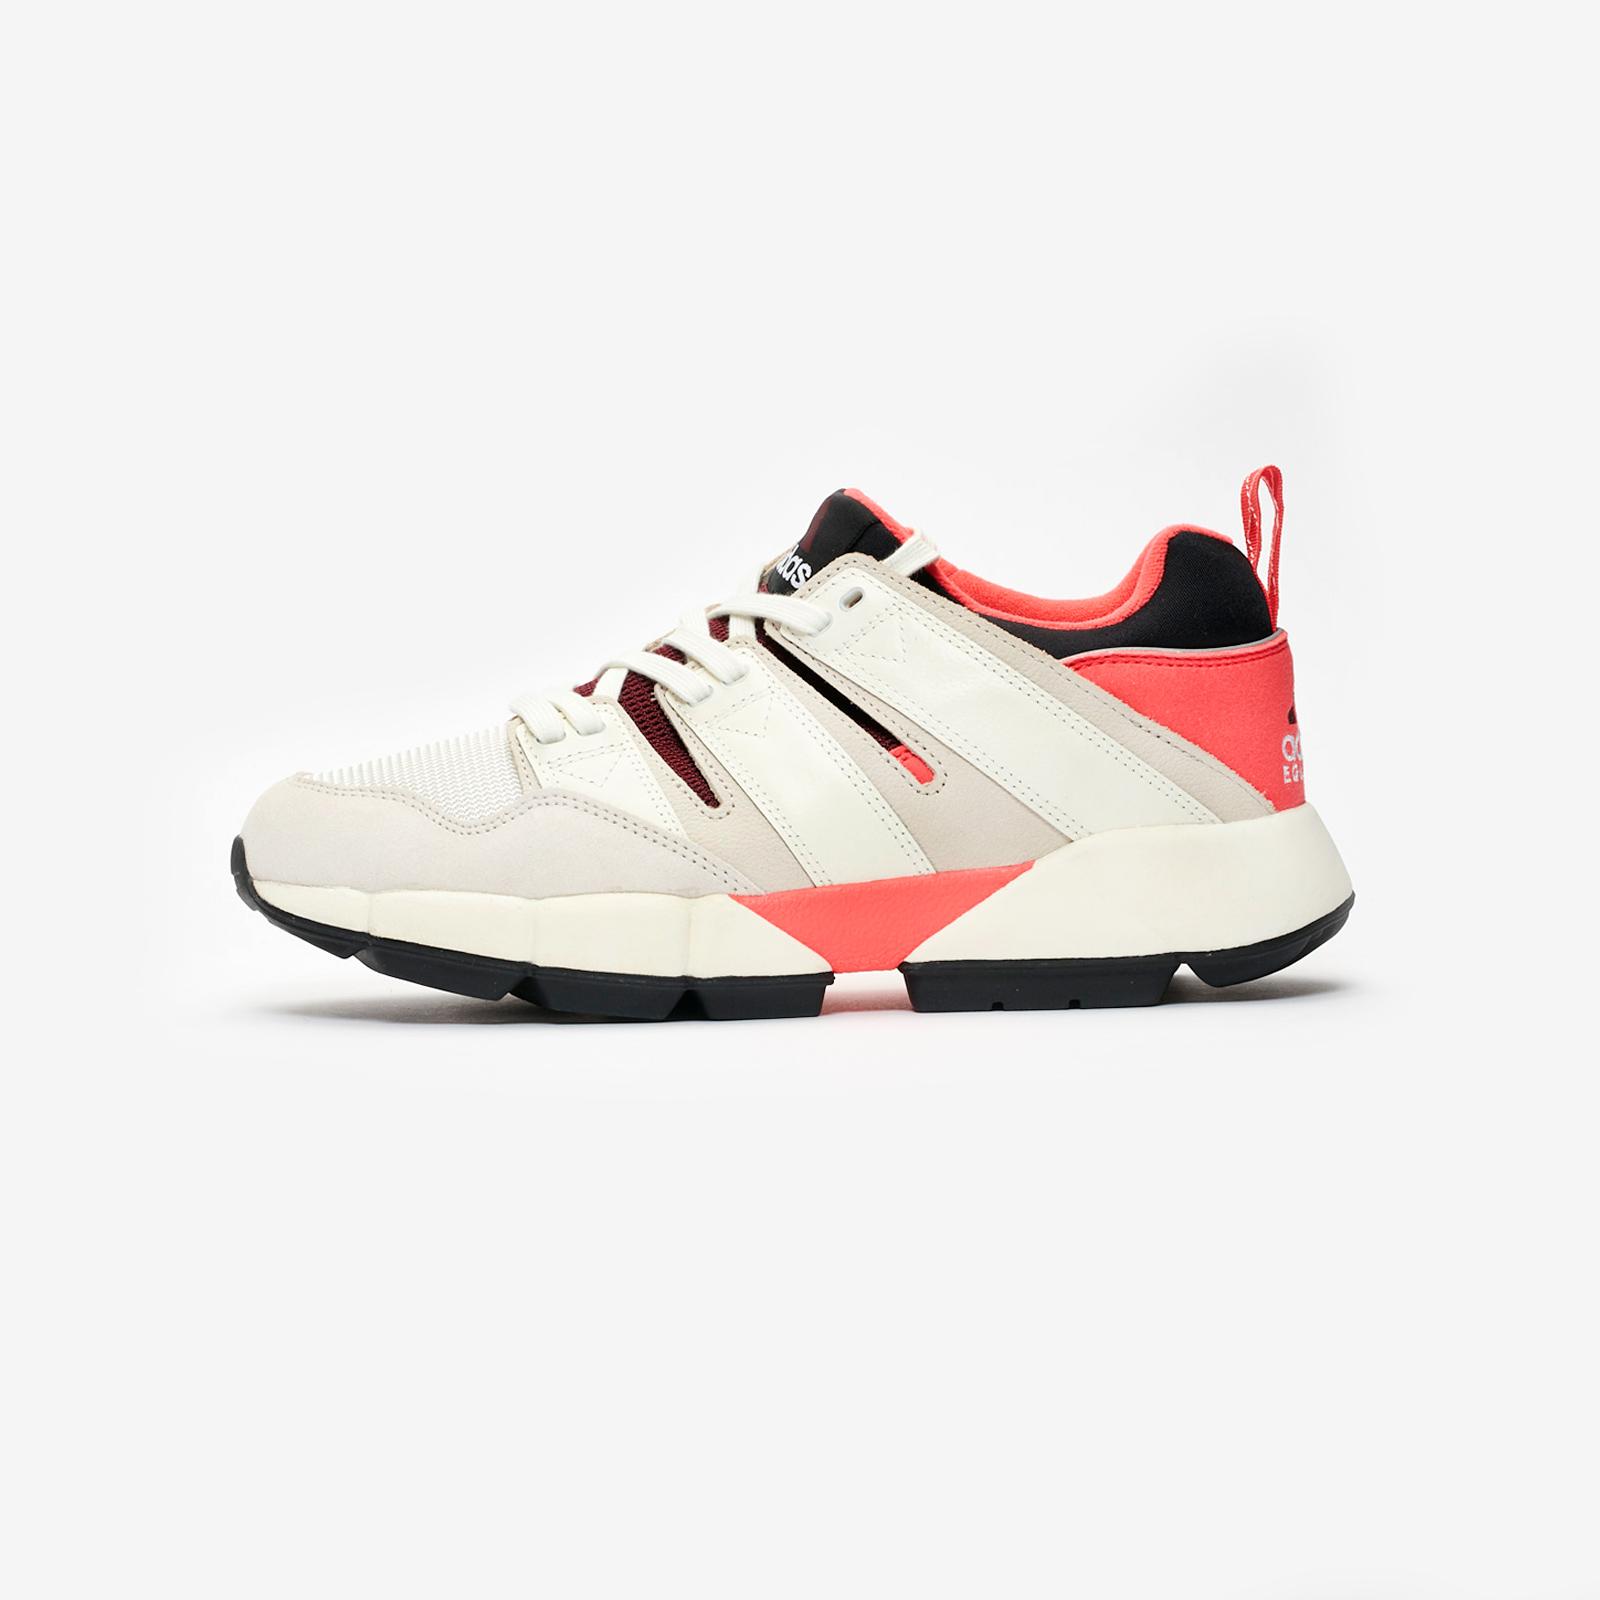 timeless design b83b1 e422d adidas EQT Cushion 2 - Db2717 - Sneakersnstuff   sneakers   streetwear  online since 1999